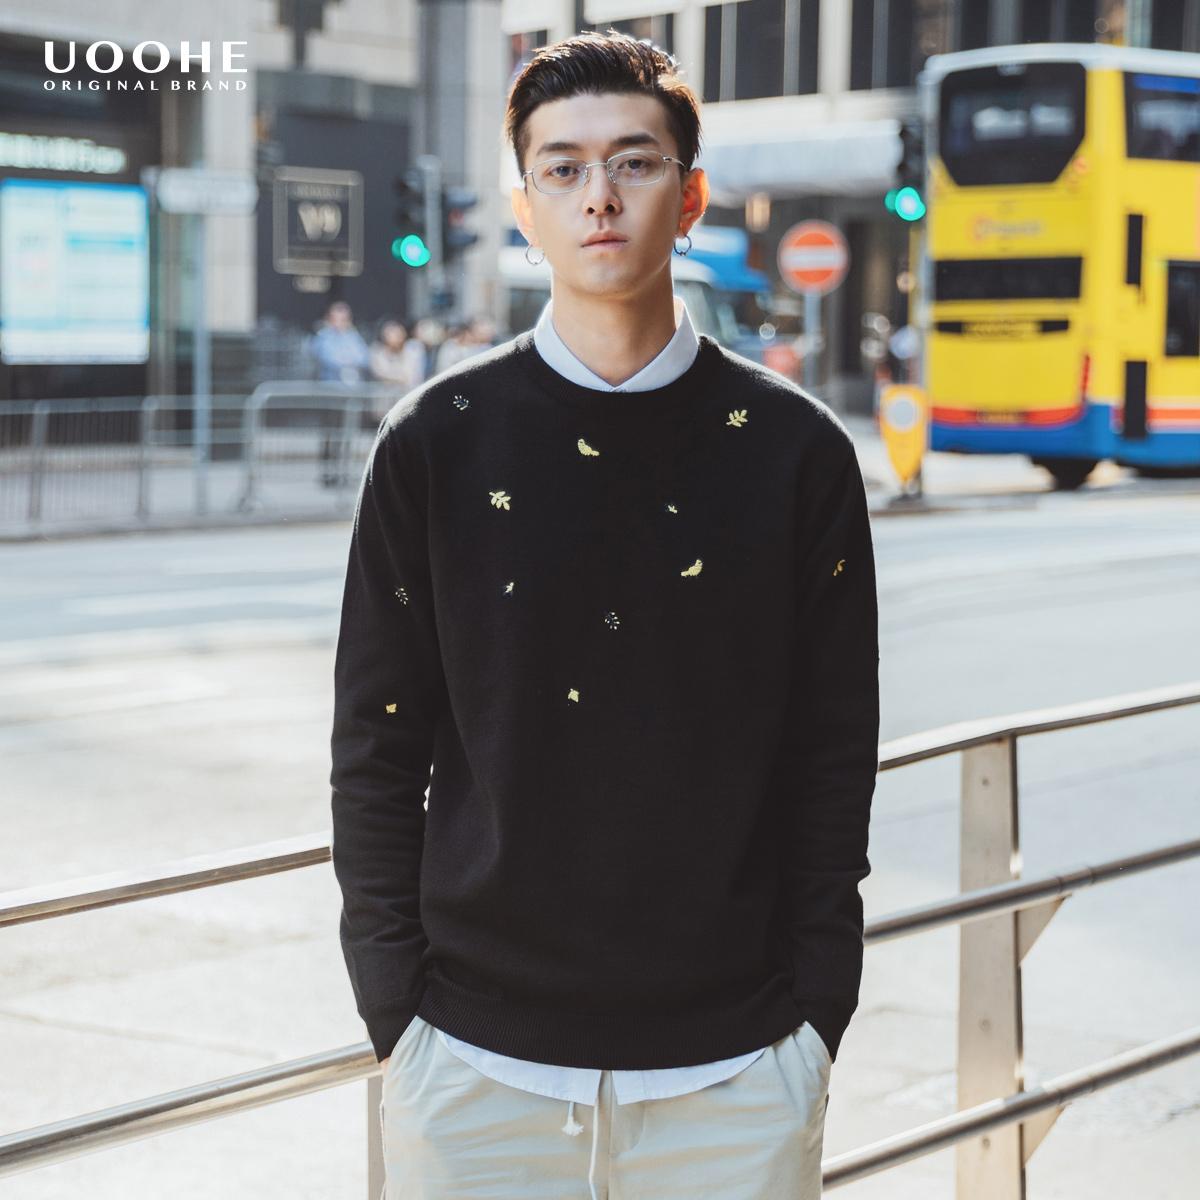 UOOHE男士针织衫 2019秋季新款黑色打底衫 时尚潮流刺绣加厚毛衣